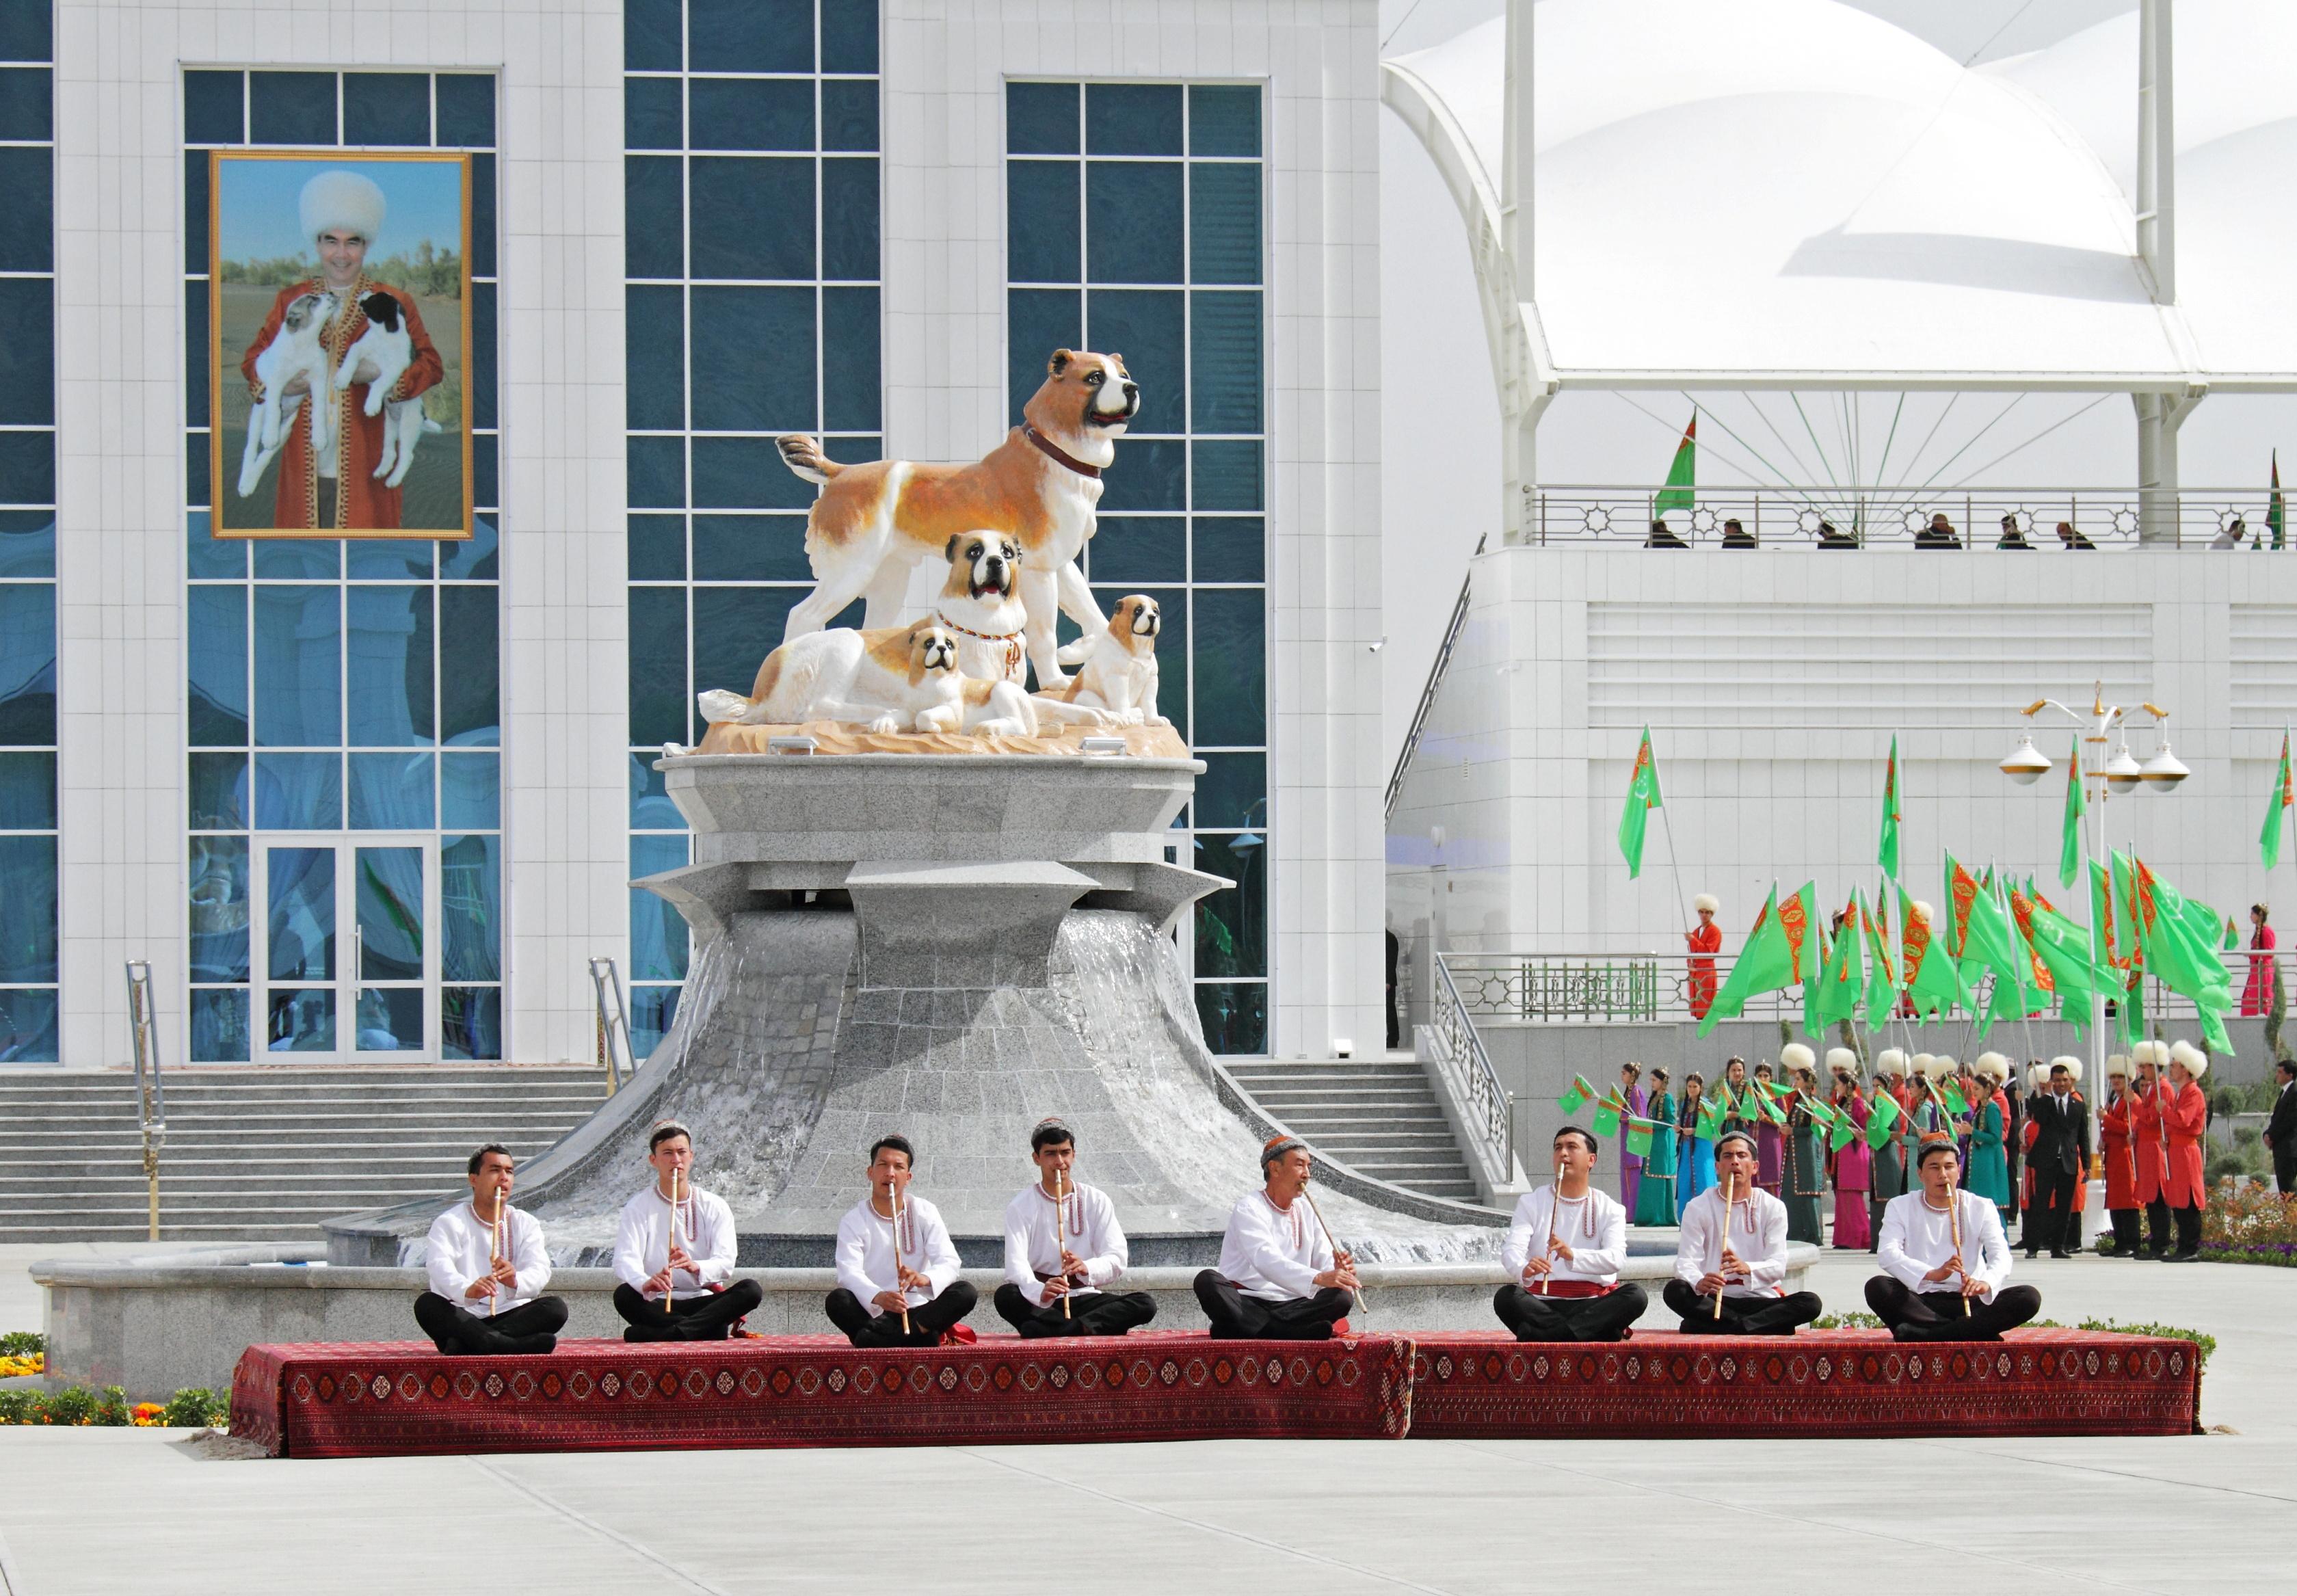 Musicians perform during celebrations for the national Turkmen Horse Day and the Turkmen Shepherd Dog Day near Ashgabat, Turkmenistan April 25, 2021. REUTERS/Vyacheslav Sarkisyan